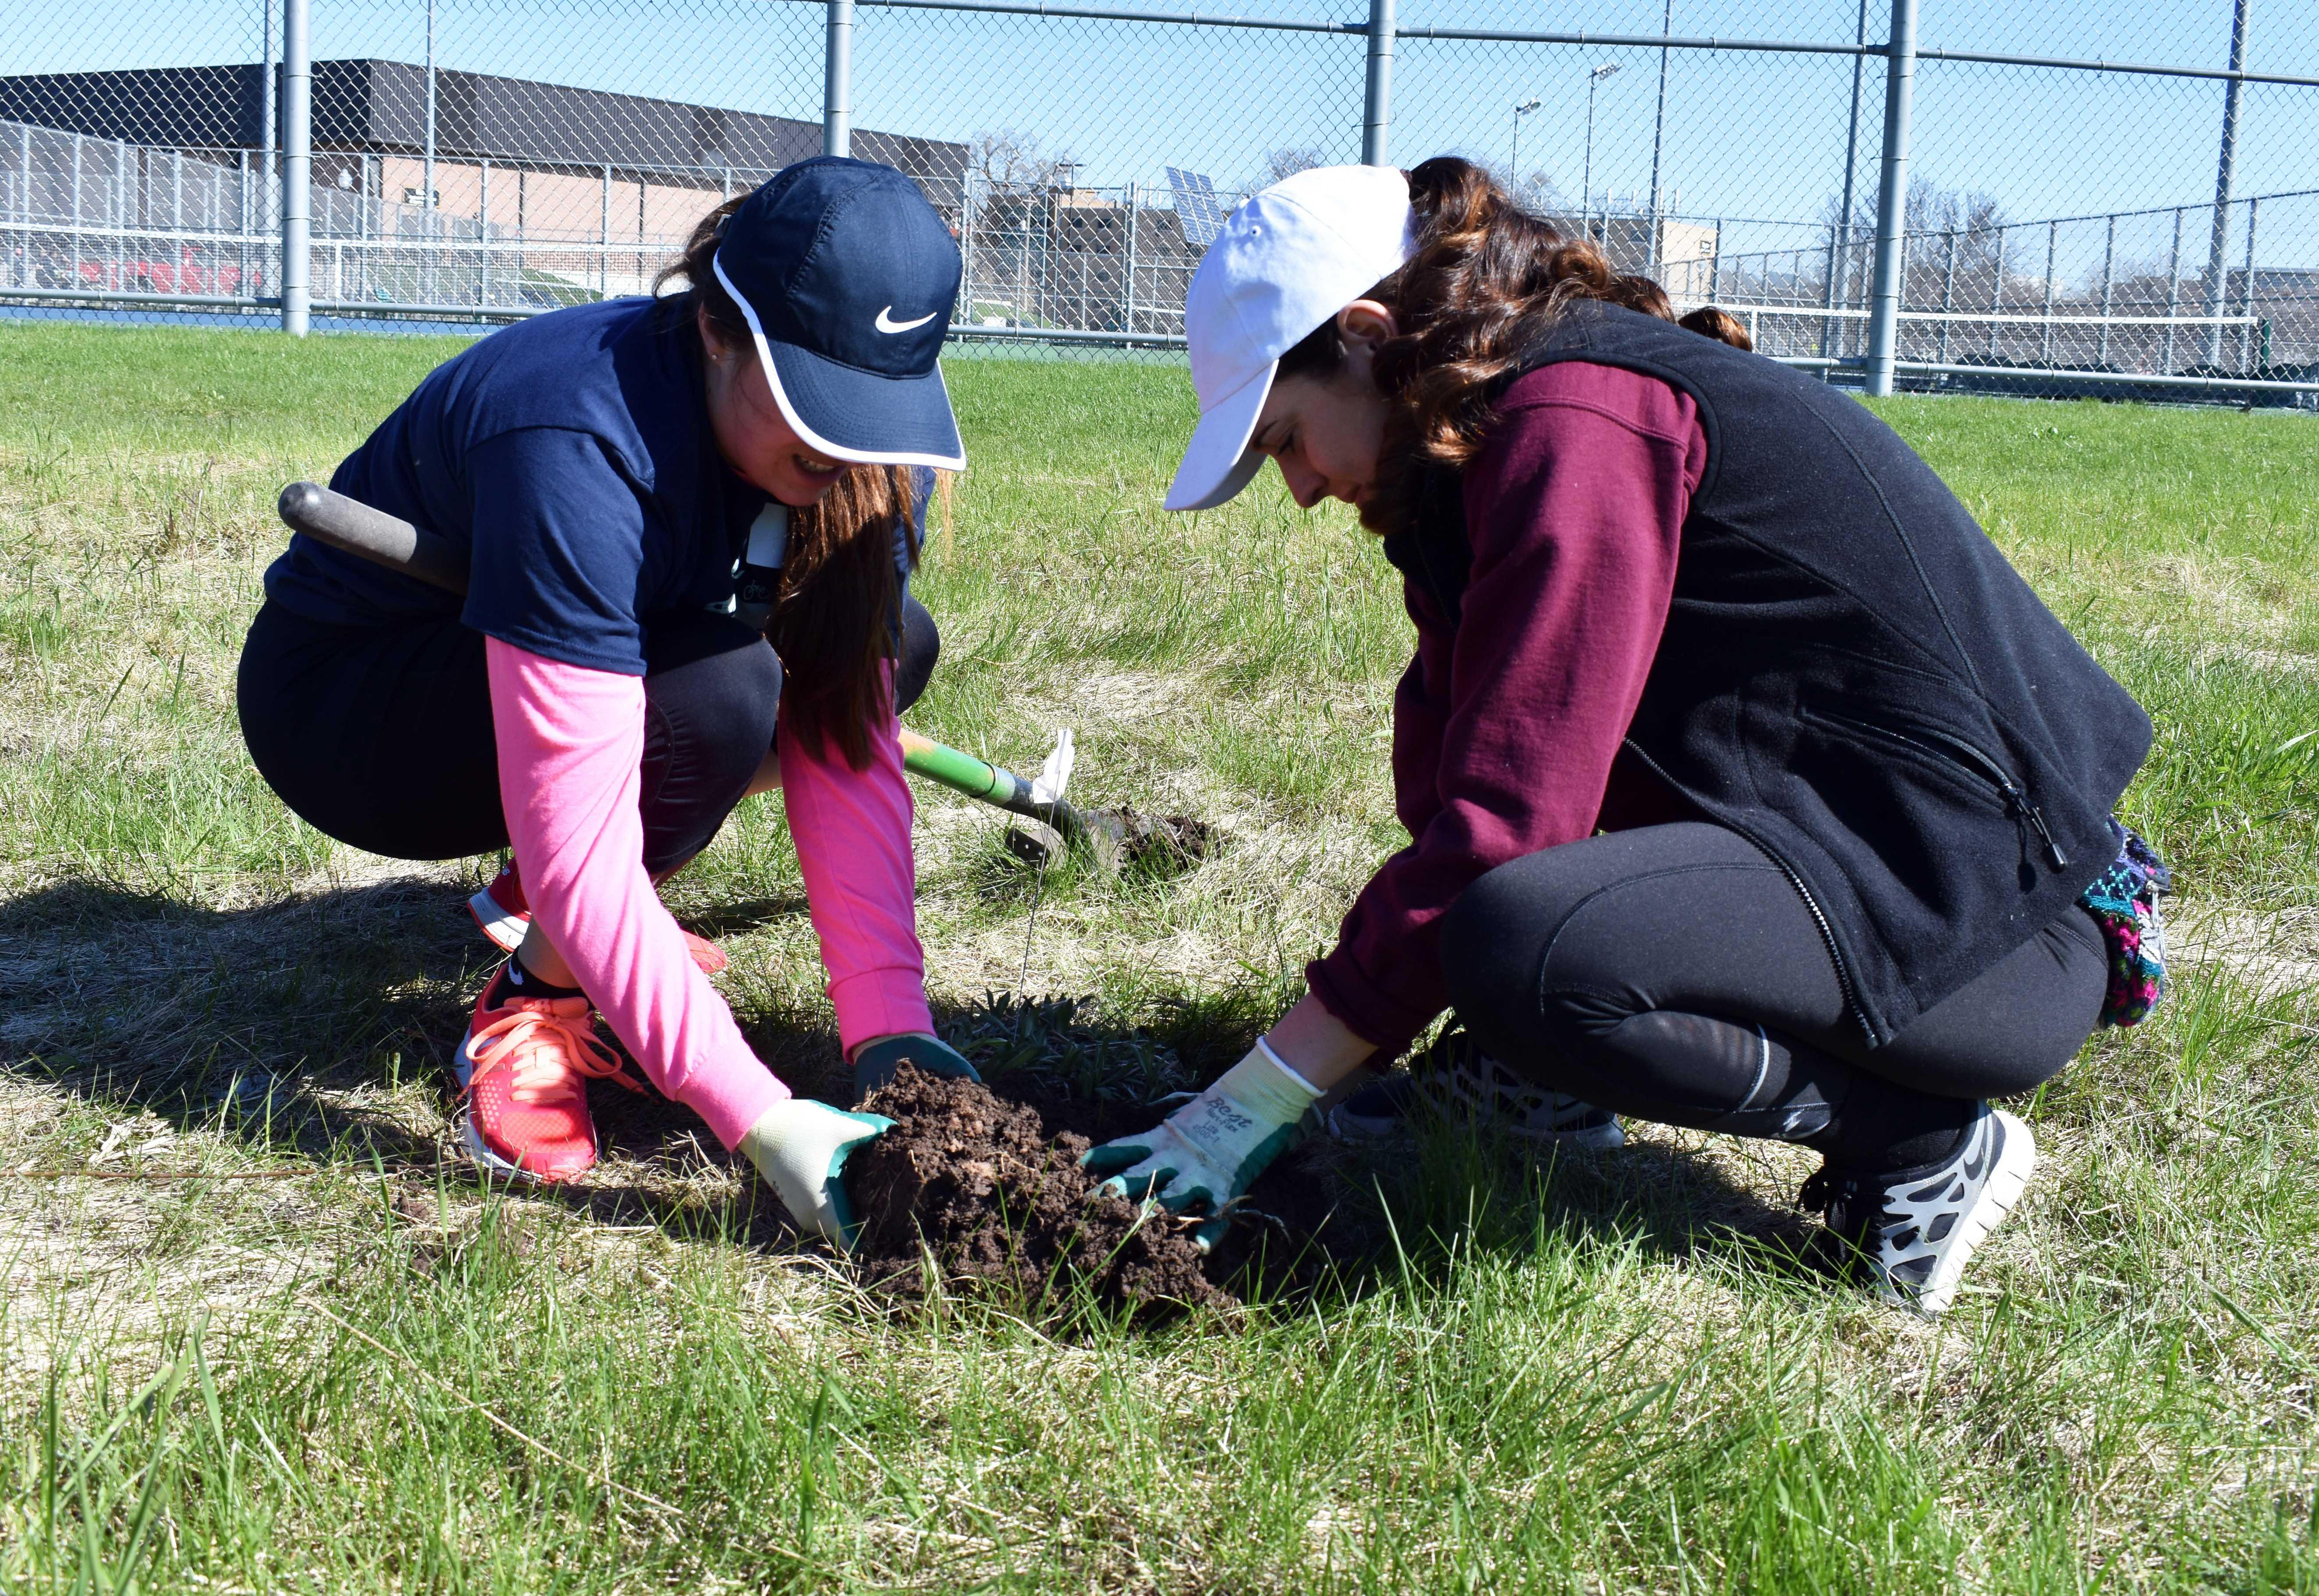 Students volunteer in the Oshkosh community